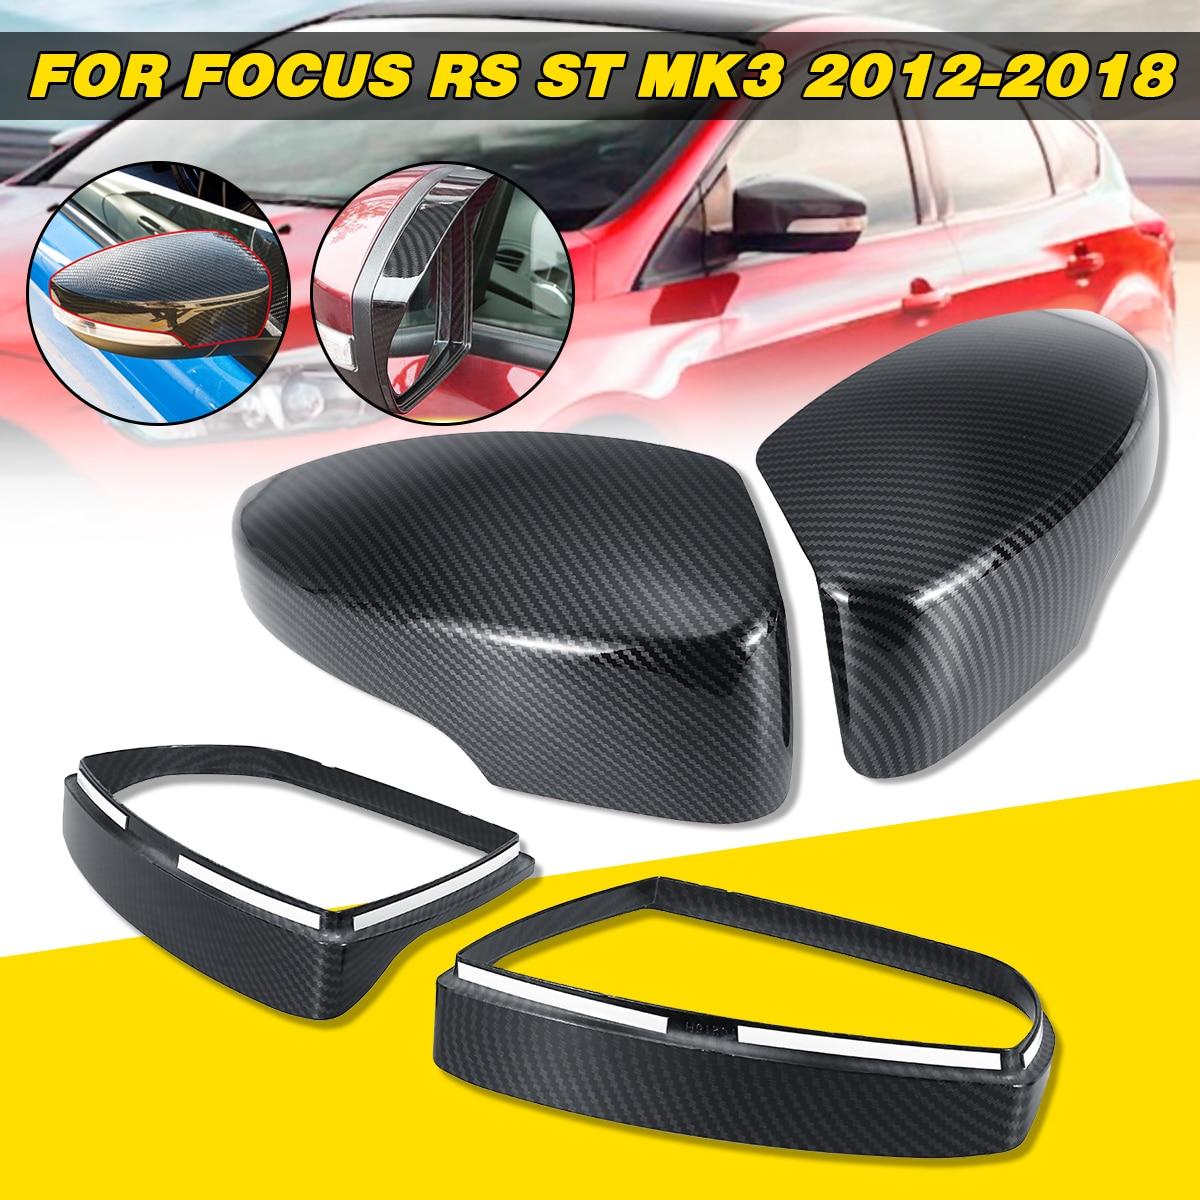 ABS Carbon Fiber Color Side Door Mirror Cover Rainproof Visor Frame Sun Guard Sticker For Ford For Focus RS ST MK3 2012-2018